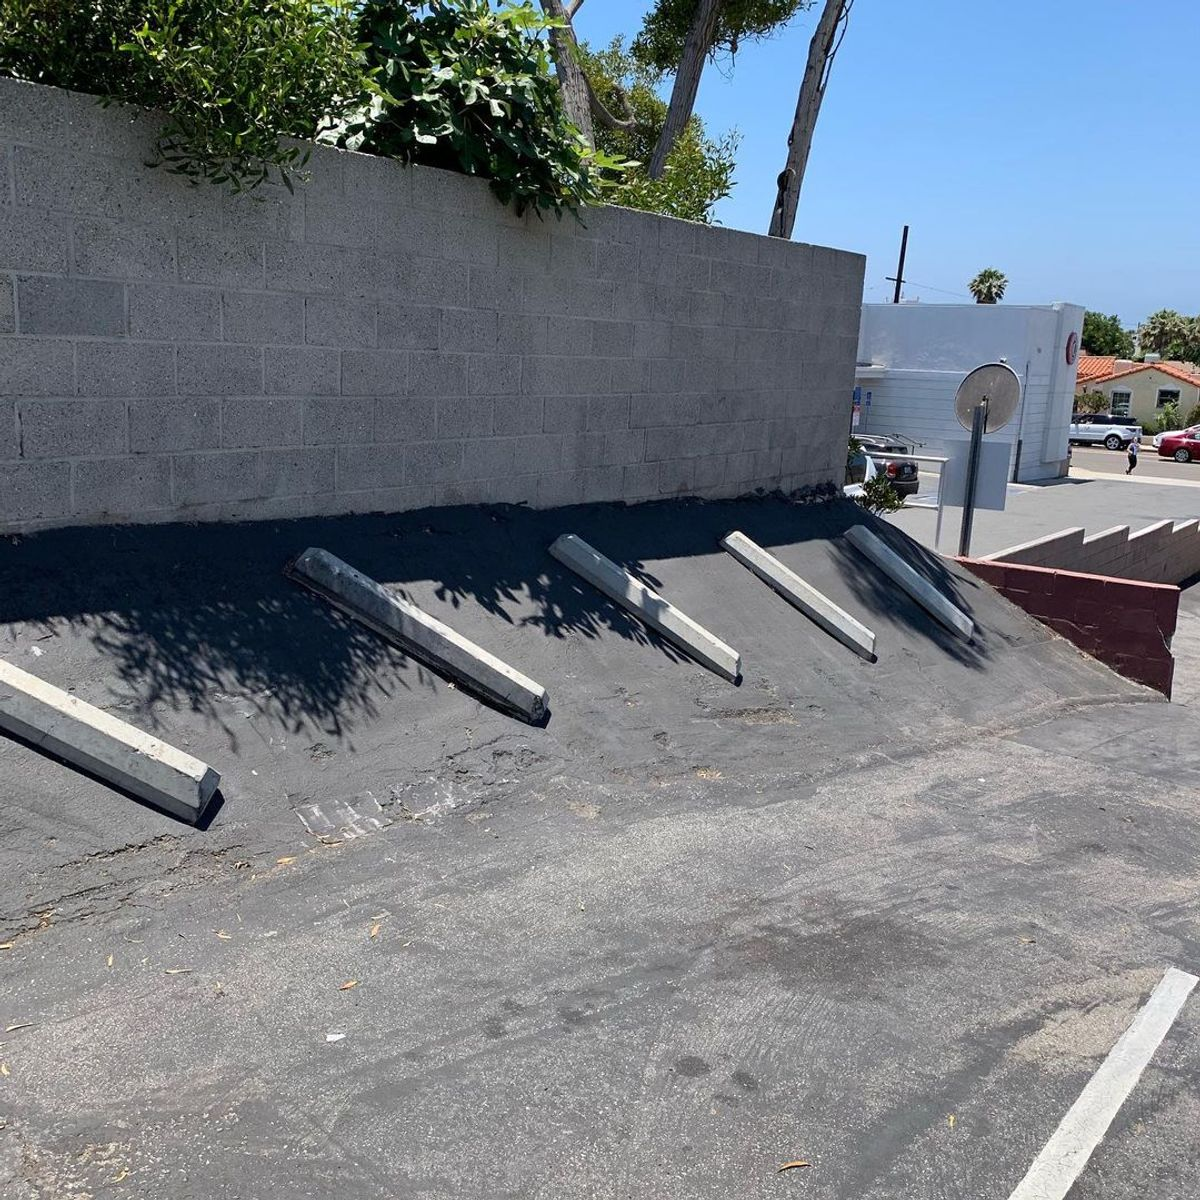 Image for skate spot Peet's Coffee - Wallride / Bump Over Rail